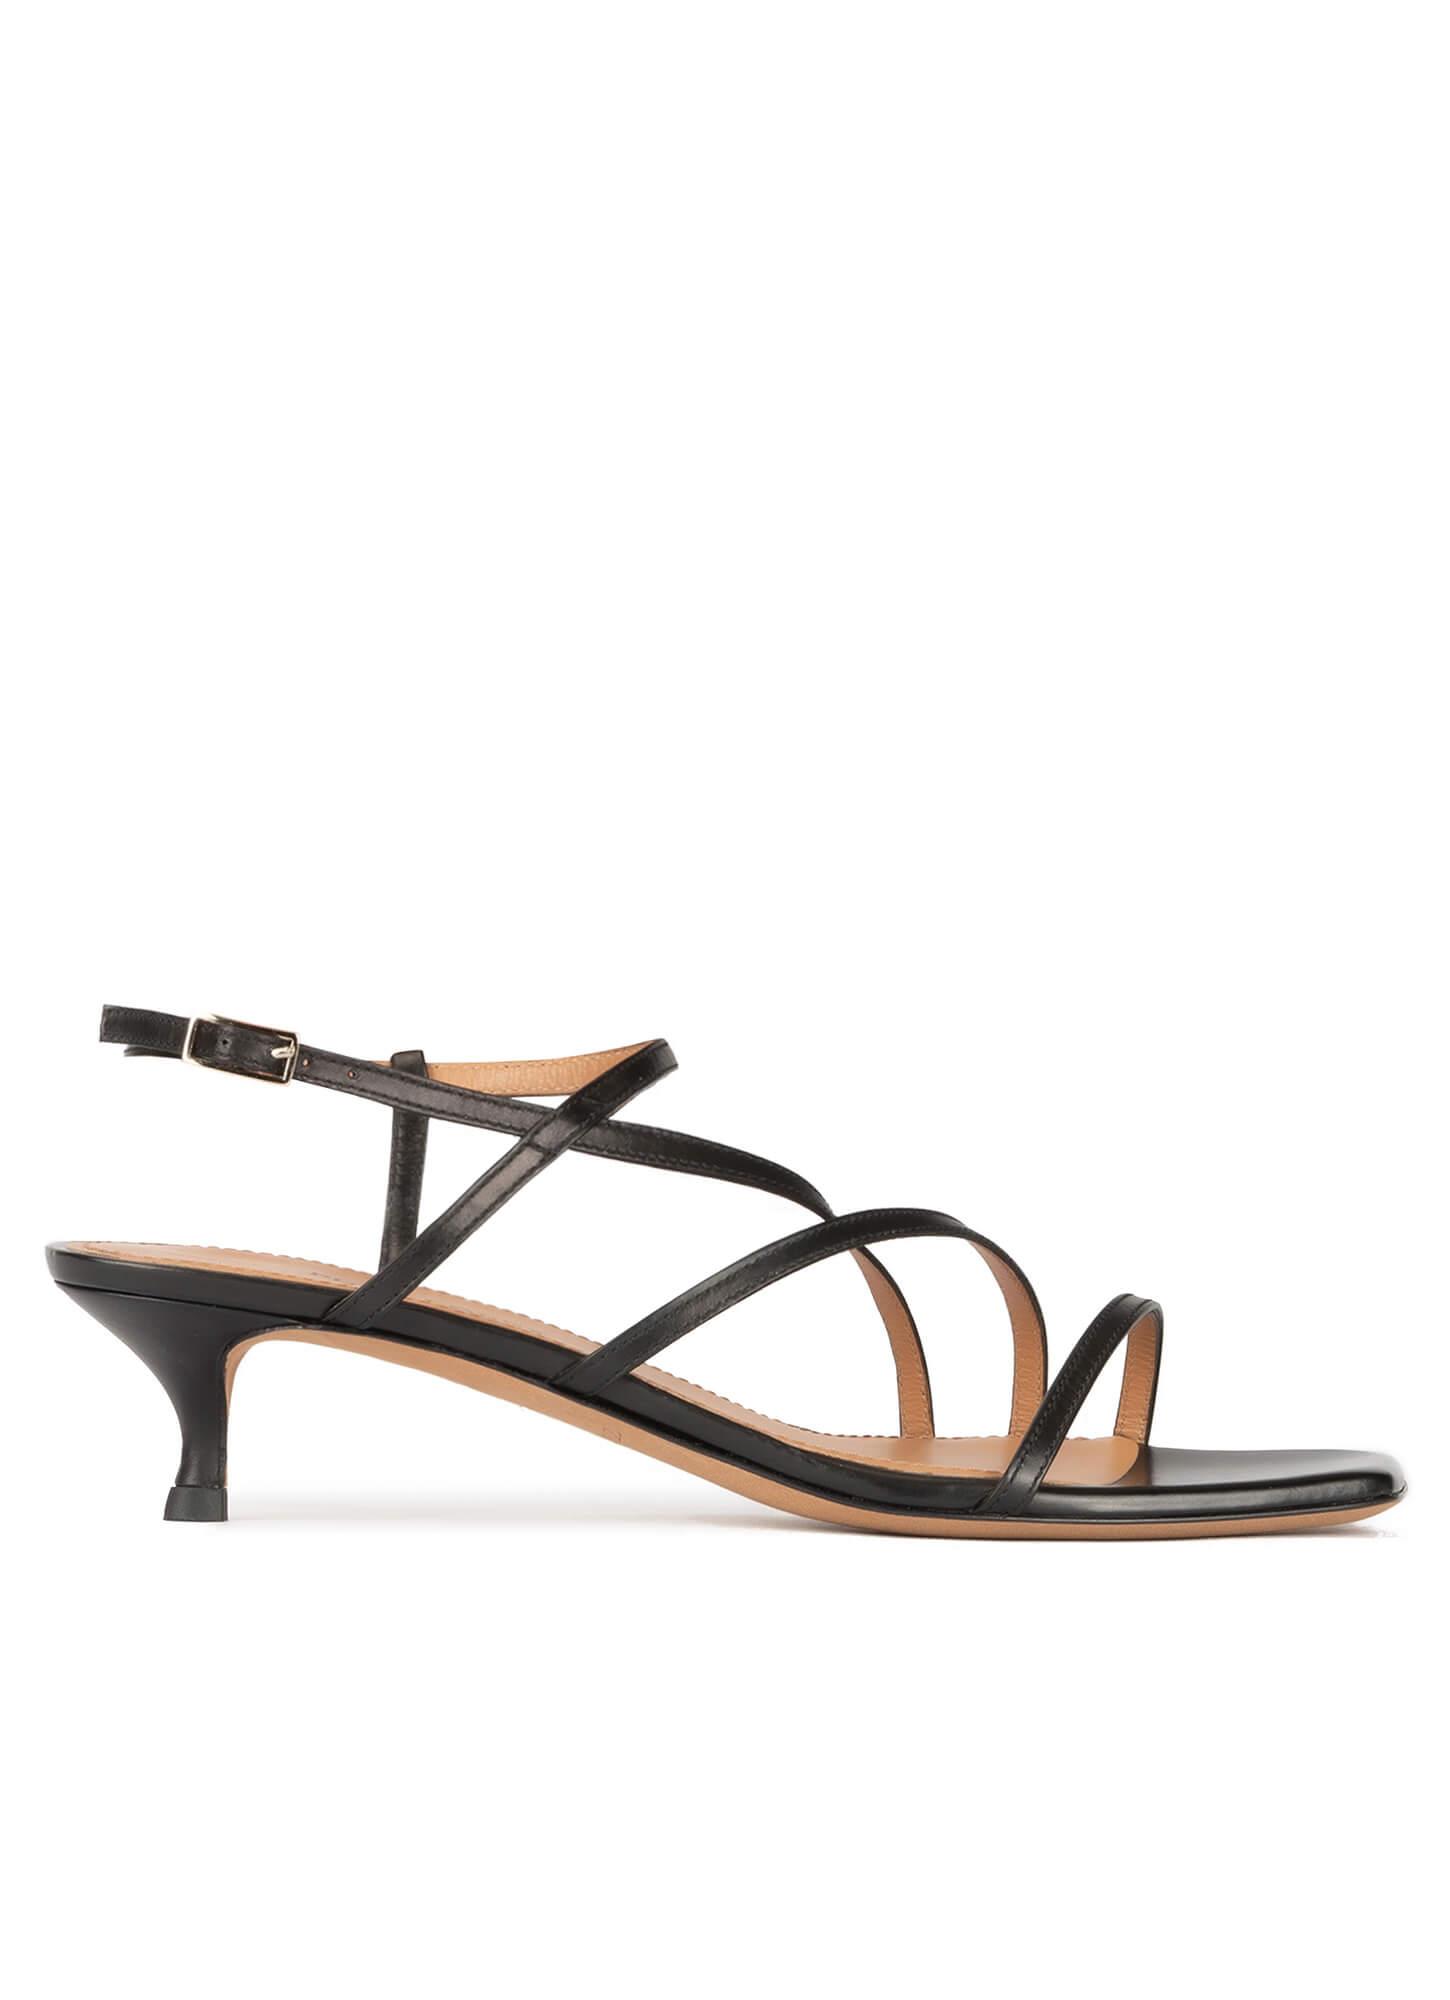 Strappy mid heel sandals in black